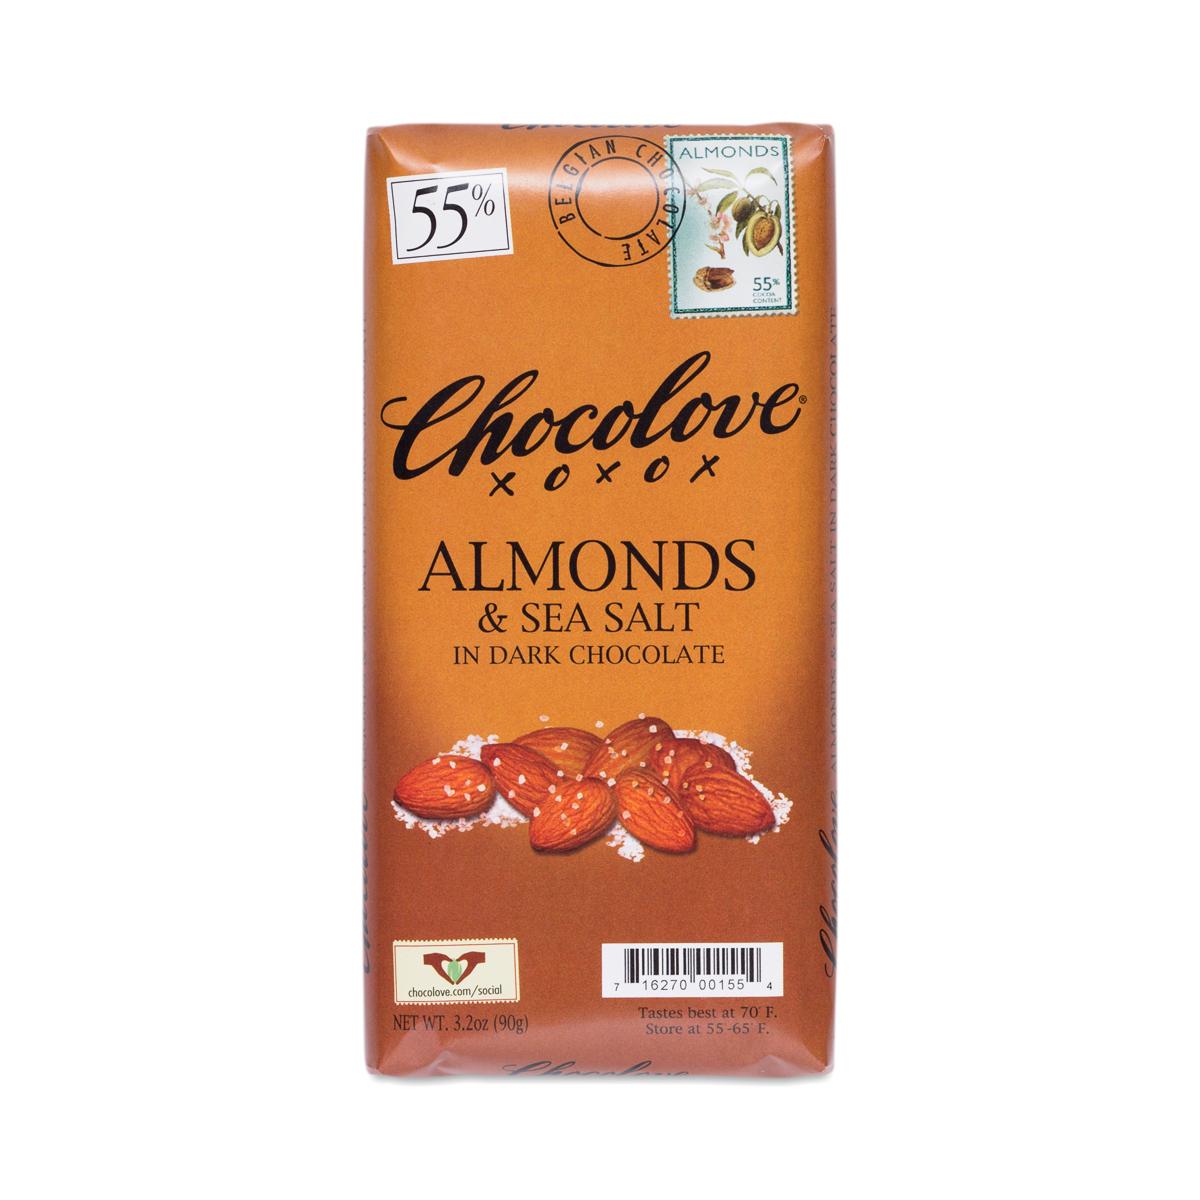 Almonds & Sea Salt Dark Chocolate Bar, 55% Cocoa - Thrive Market